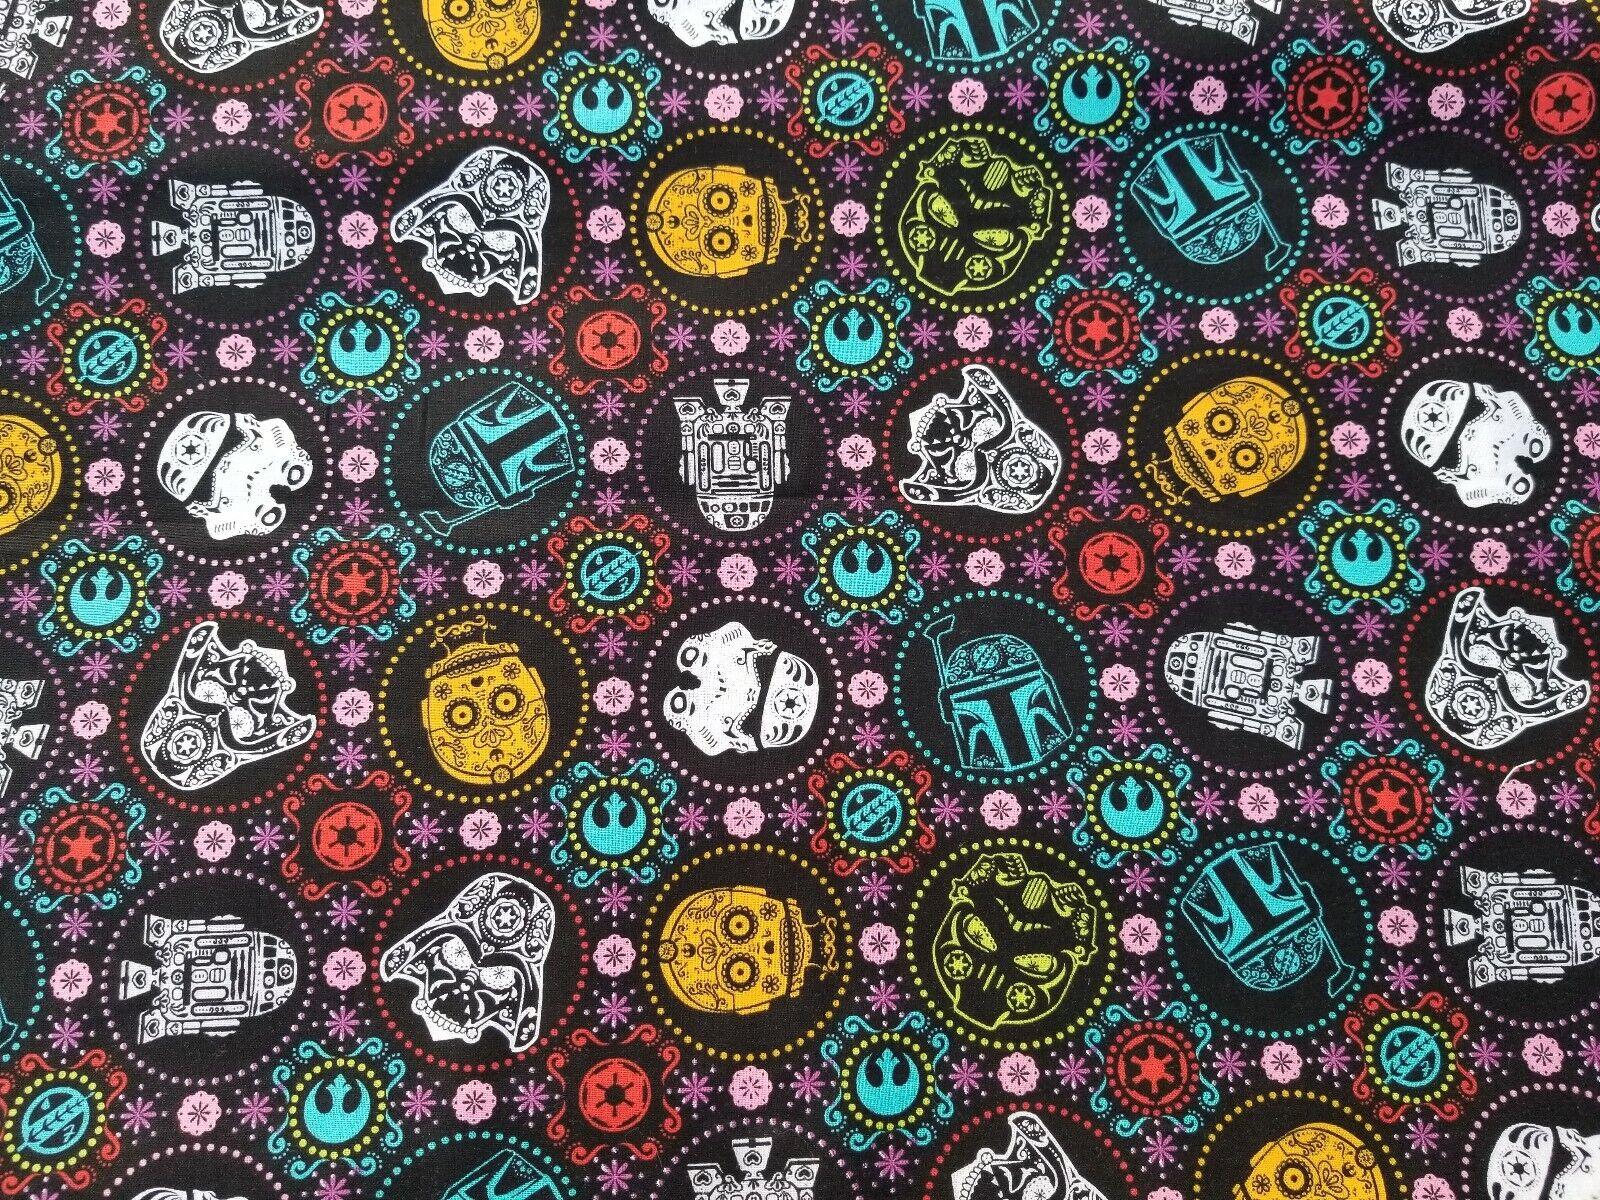 Star Wars R2d2 And C3po Sugar Skulls Cotton Fabric 8 Yards For Sale Online Ebay